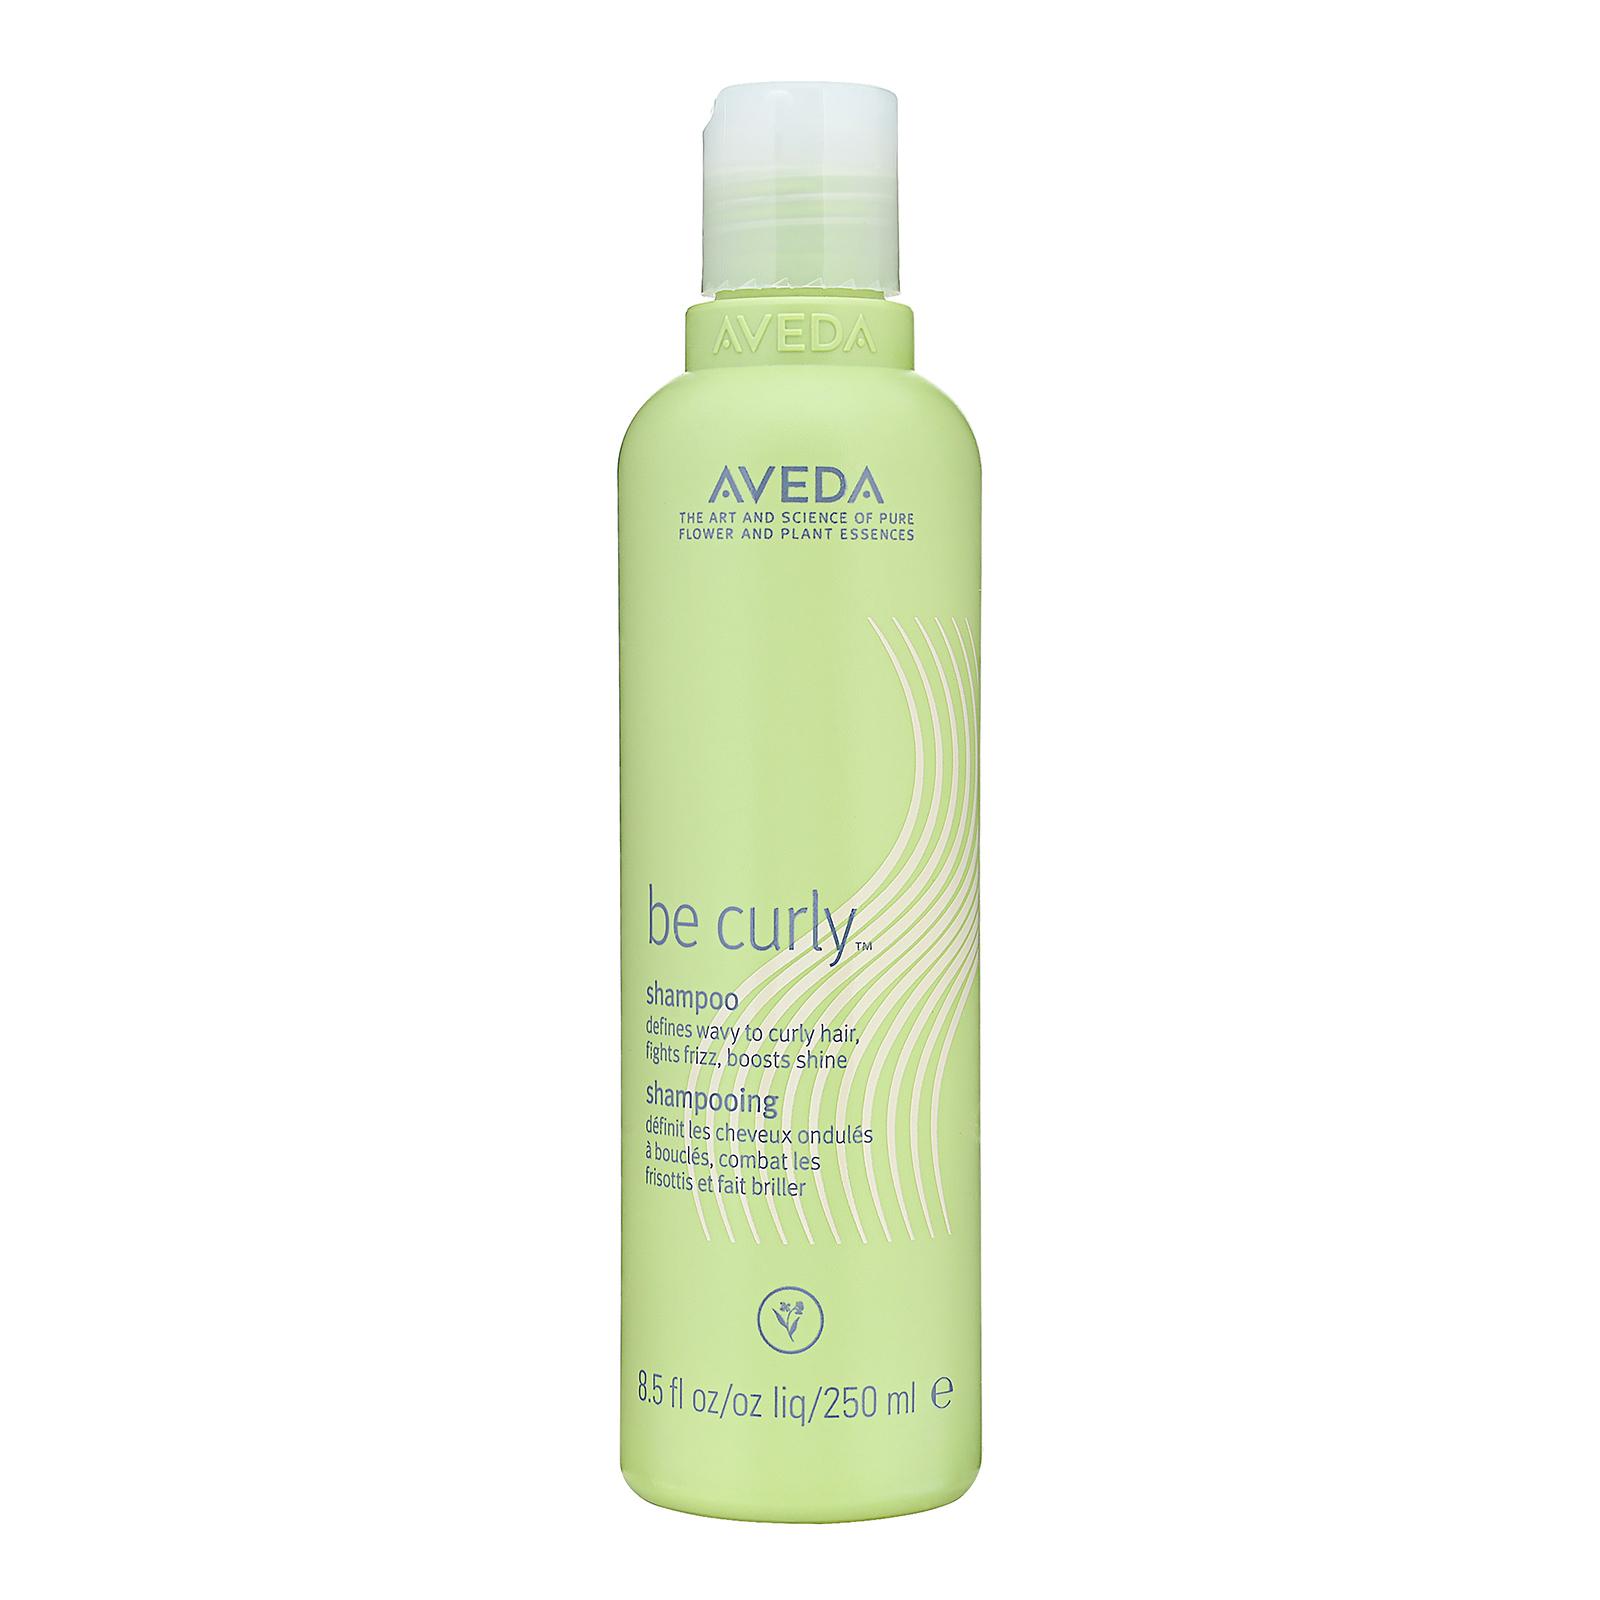 Aveda Be Curly™ Shampoo 8.5oz, 250ml